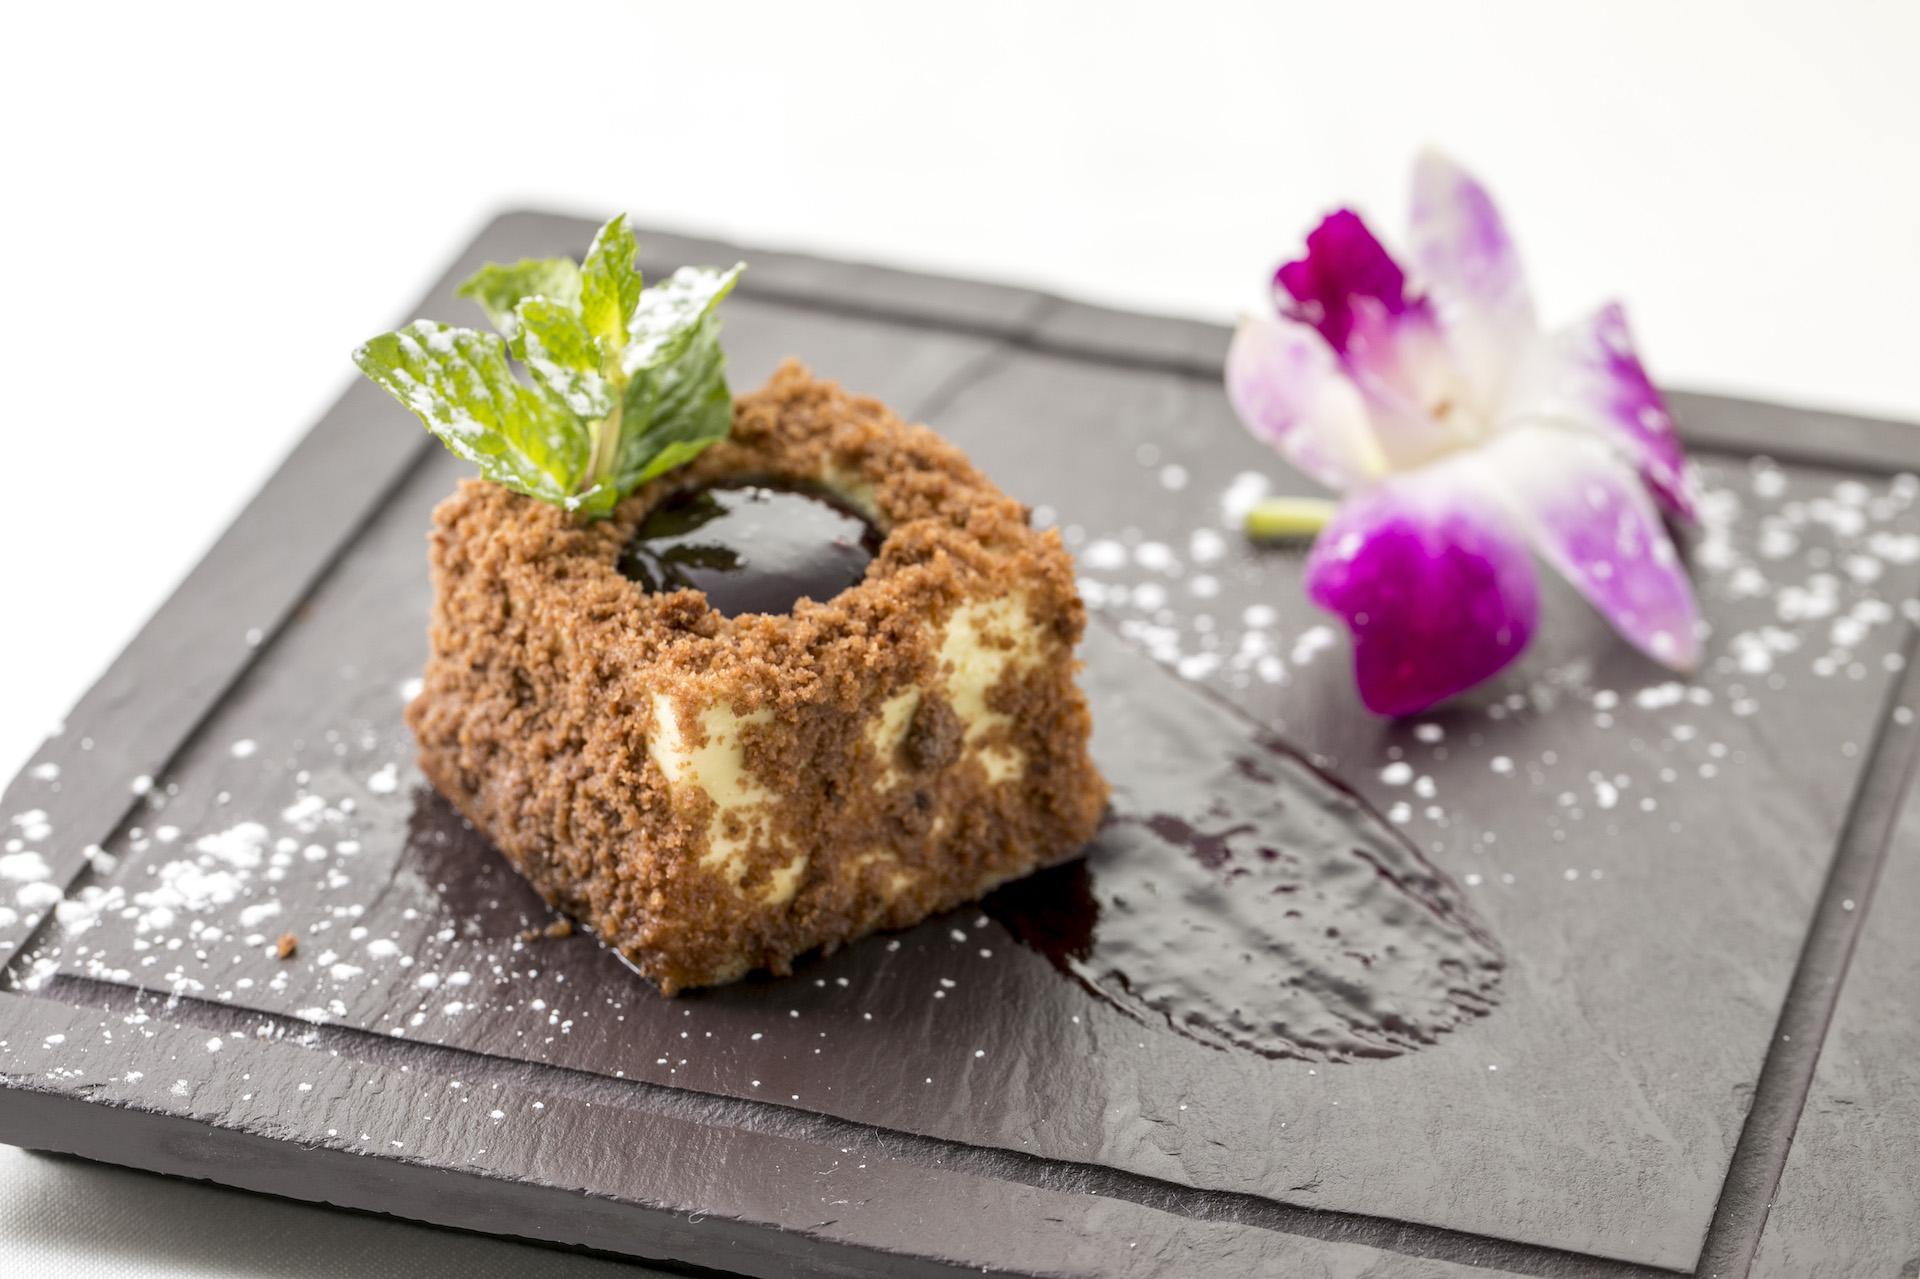 Pistachion Bronte ピスタチオブロンテ($12)   シチリア島のエトナ山に近いブロンテの町は、ピスタチオの名産地として知られています。そのブロンテに想いを馳せて三村シェフが創り上げたデザートは、ピスタチオとチョコレートムースの上にストロベリーソースをのせ、スポンジケーキのクランブルをまぶした逸品です。